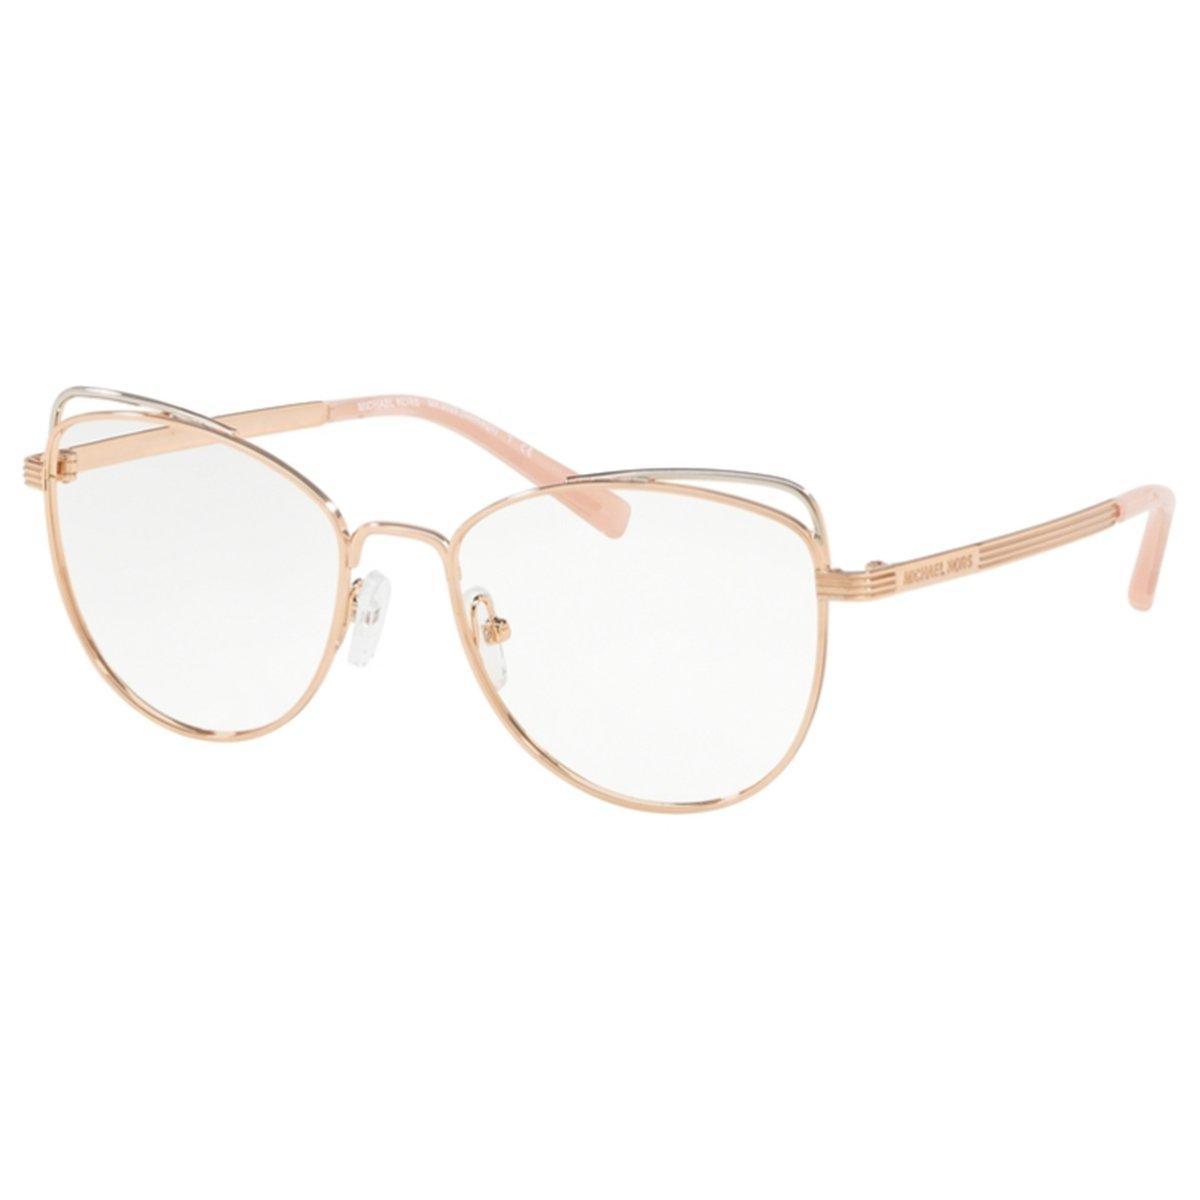 b4279871d Compre Óculos de Grau Michael Kors em 10X | Tri-Jóia Shop